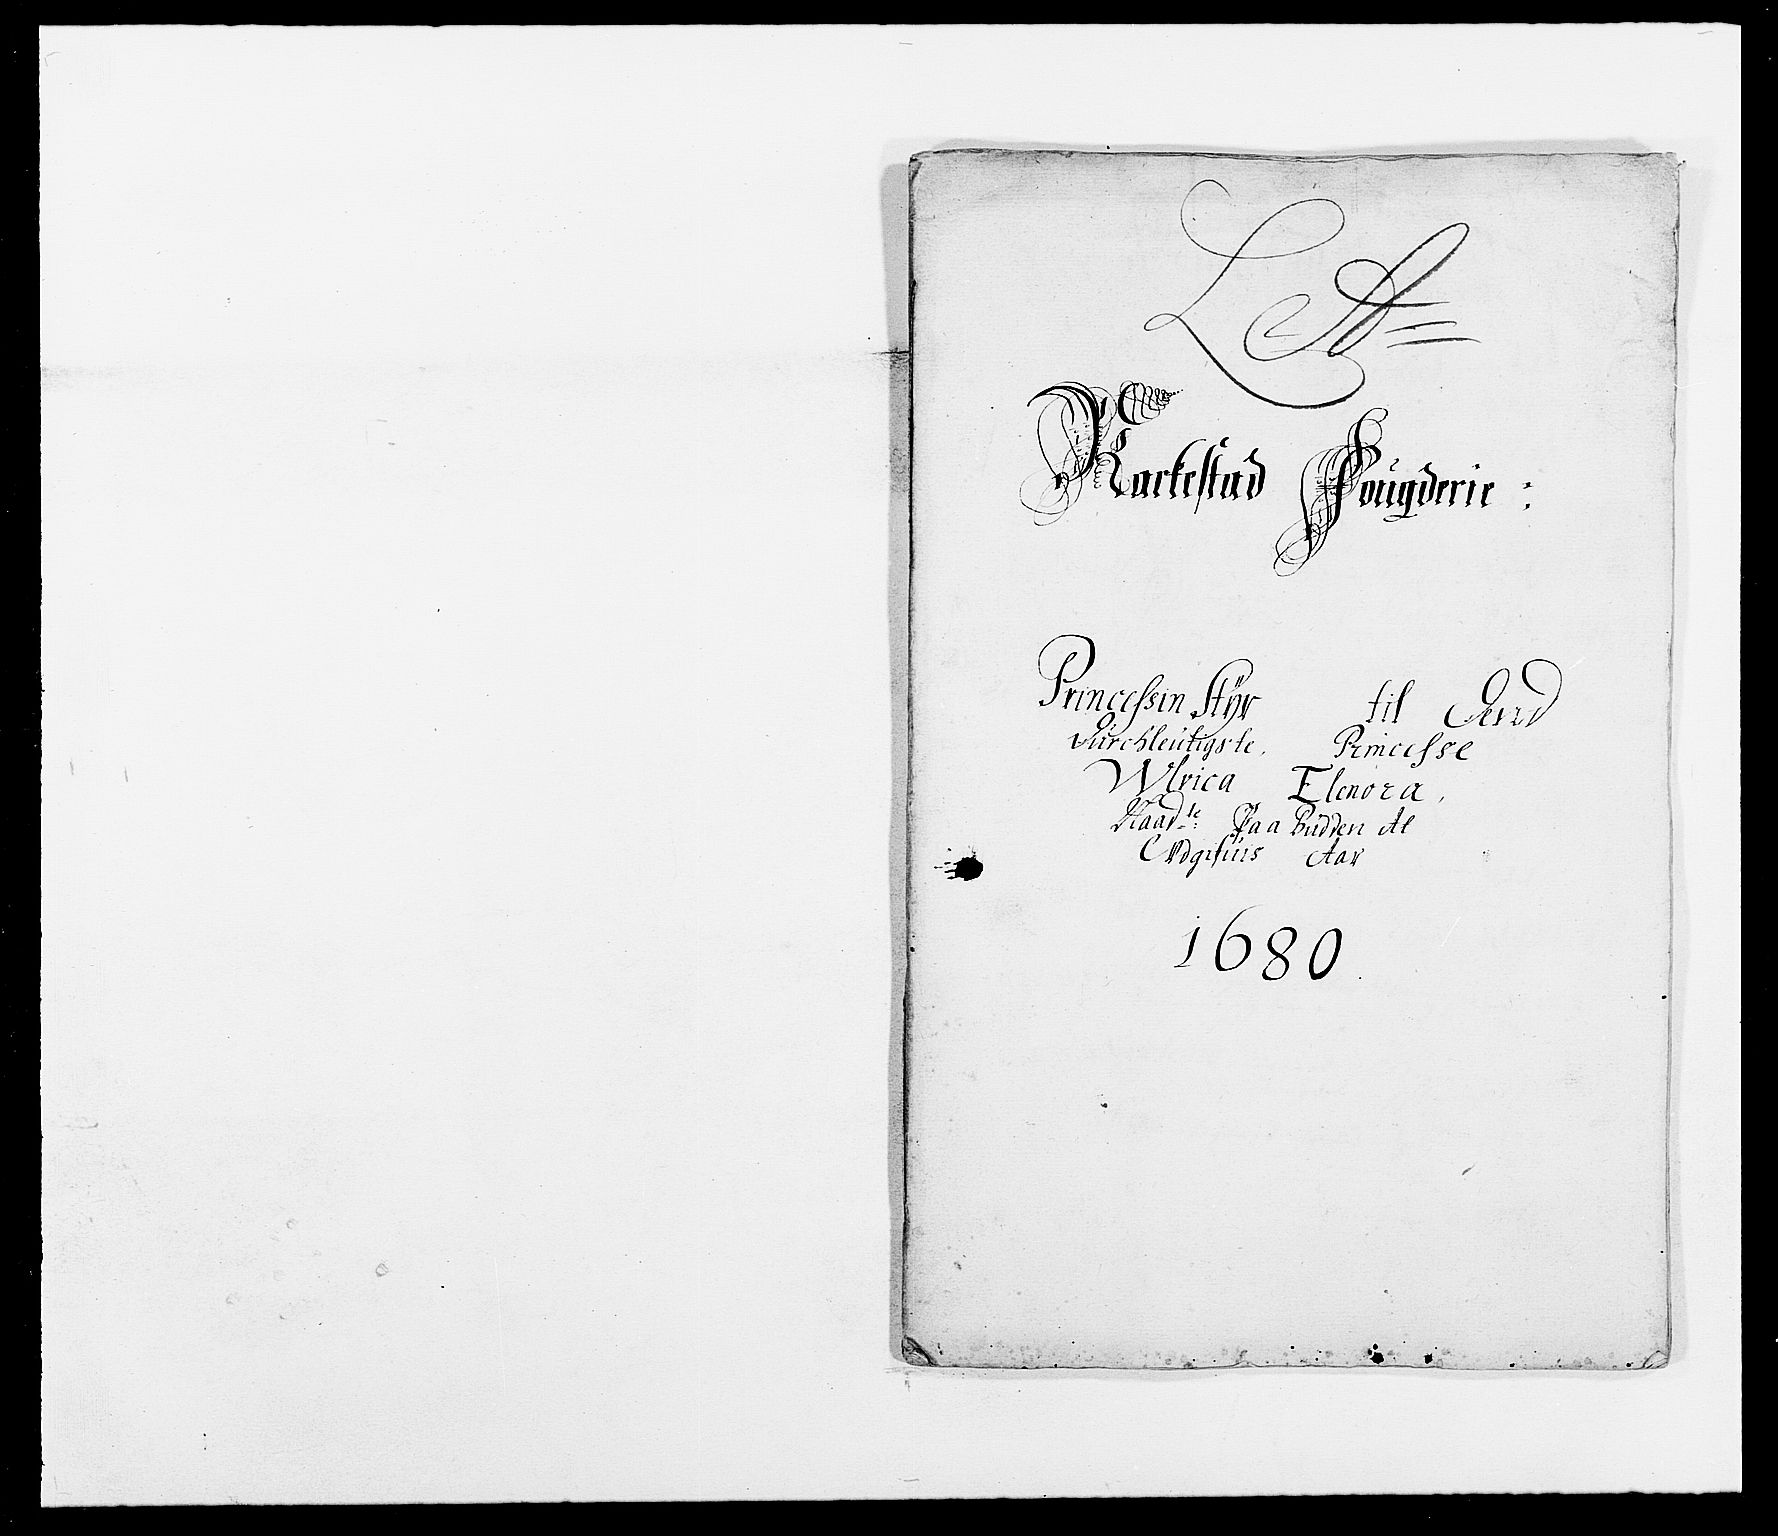 RA, Rentekammeret inntil 1814, Reviderte regnskaper, Fogderegnskap, R05/L0272: Fogderegnskap Rakkestad, 1680-1681, s. 8